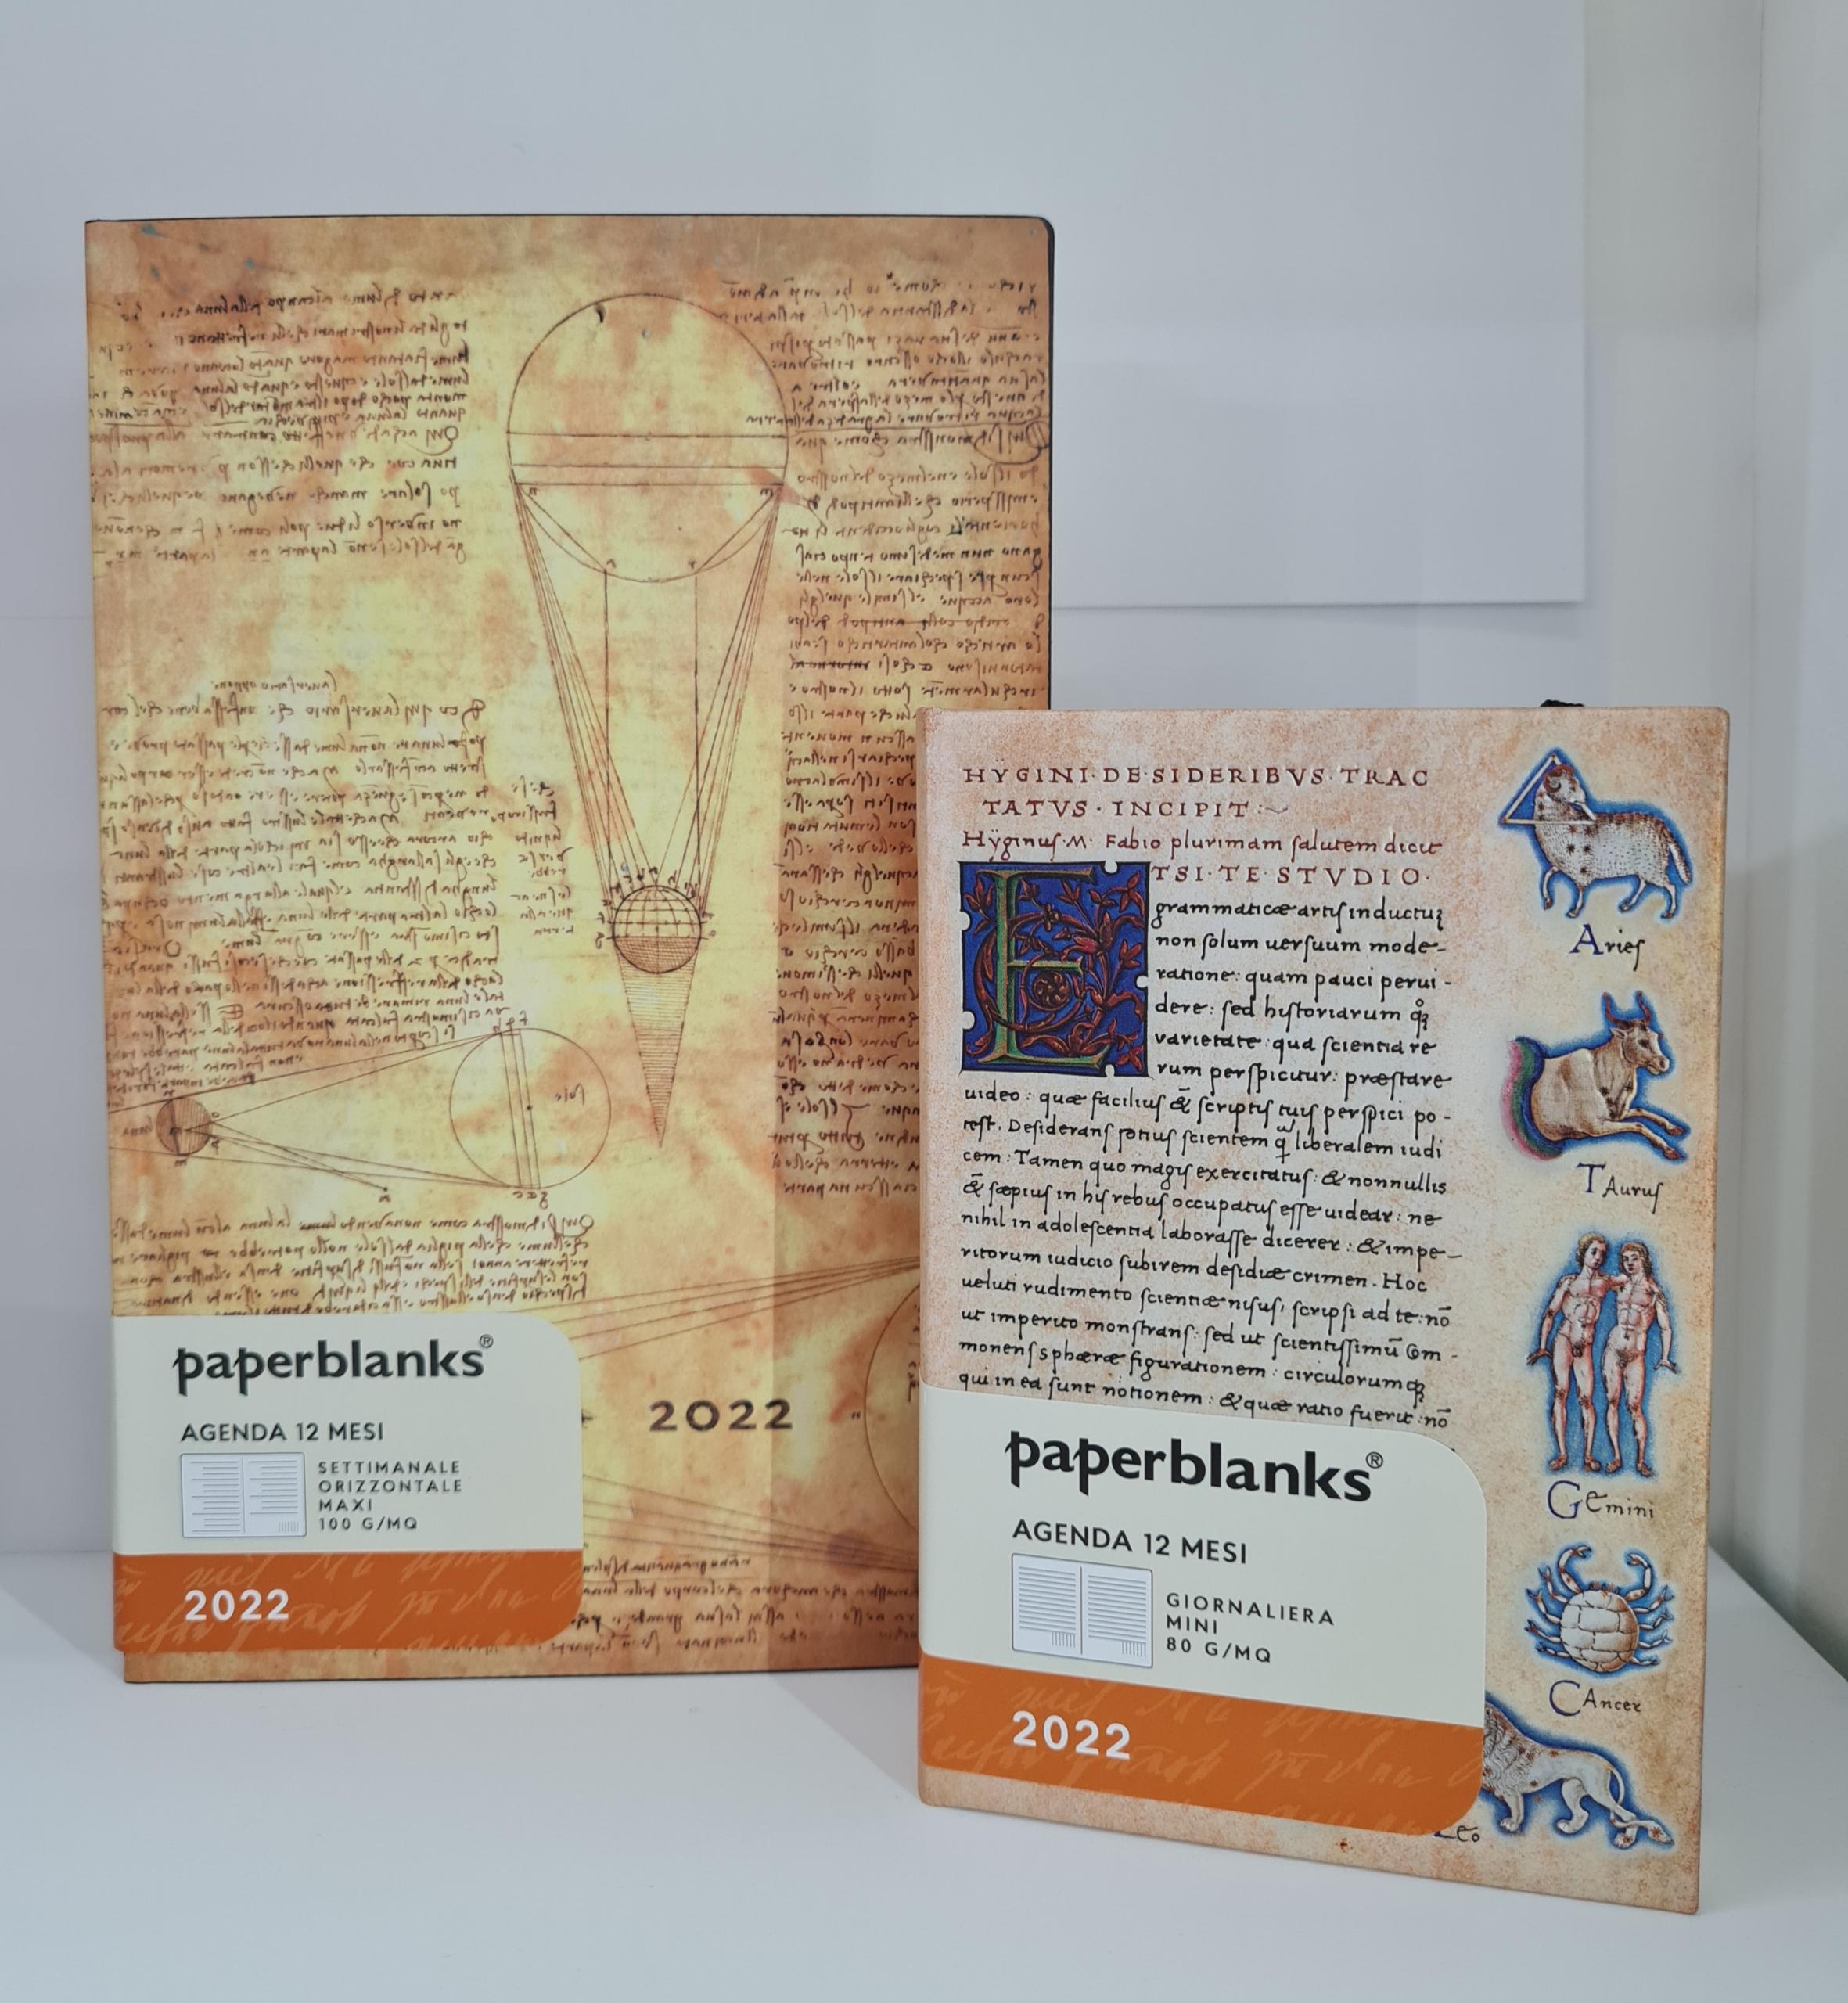 MESSAGGERIE SARDE SASSARI - PAPERBLANCKS -AGENDE TACCUINI NOTEBOOK